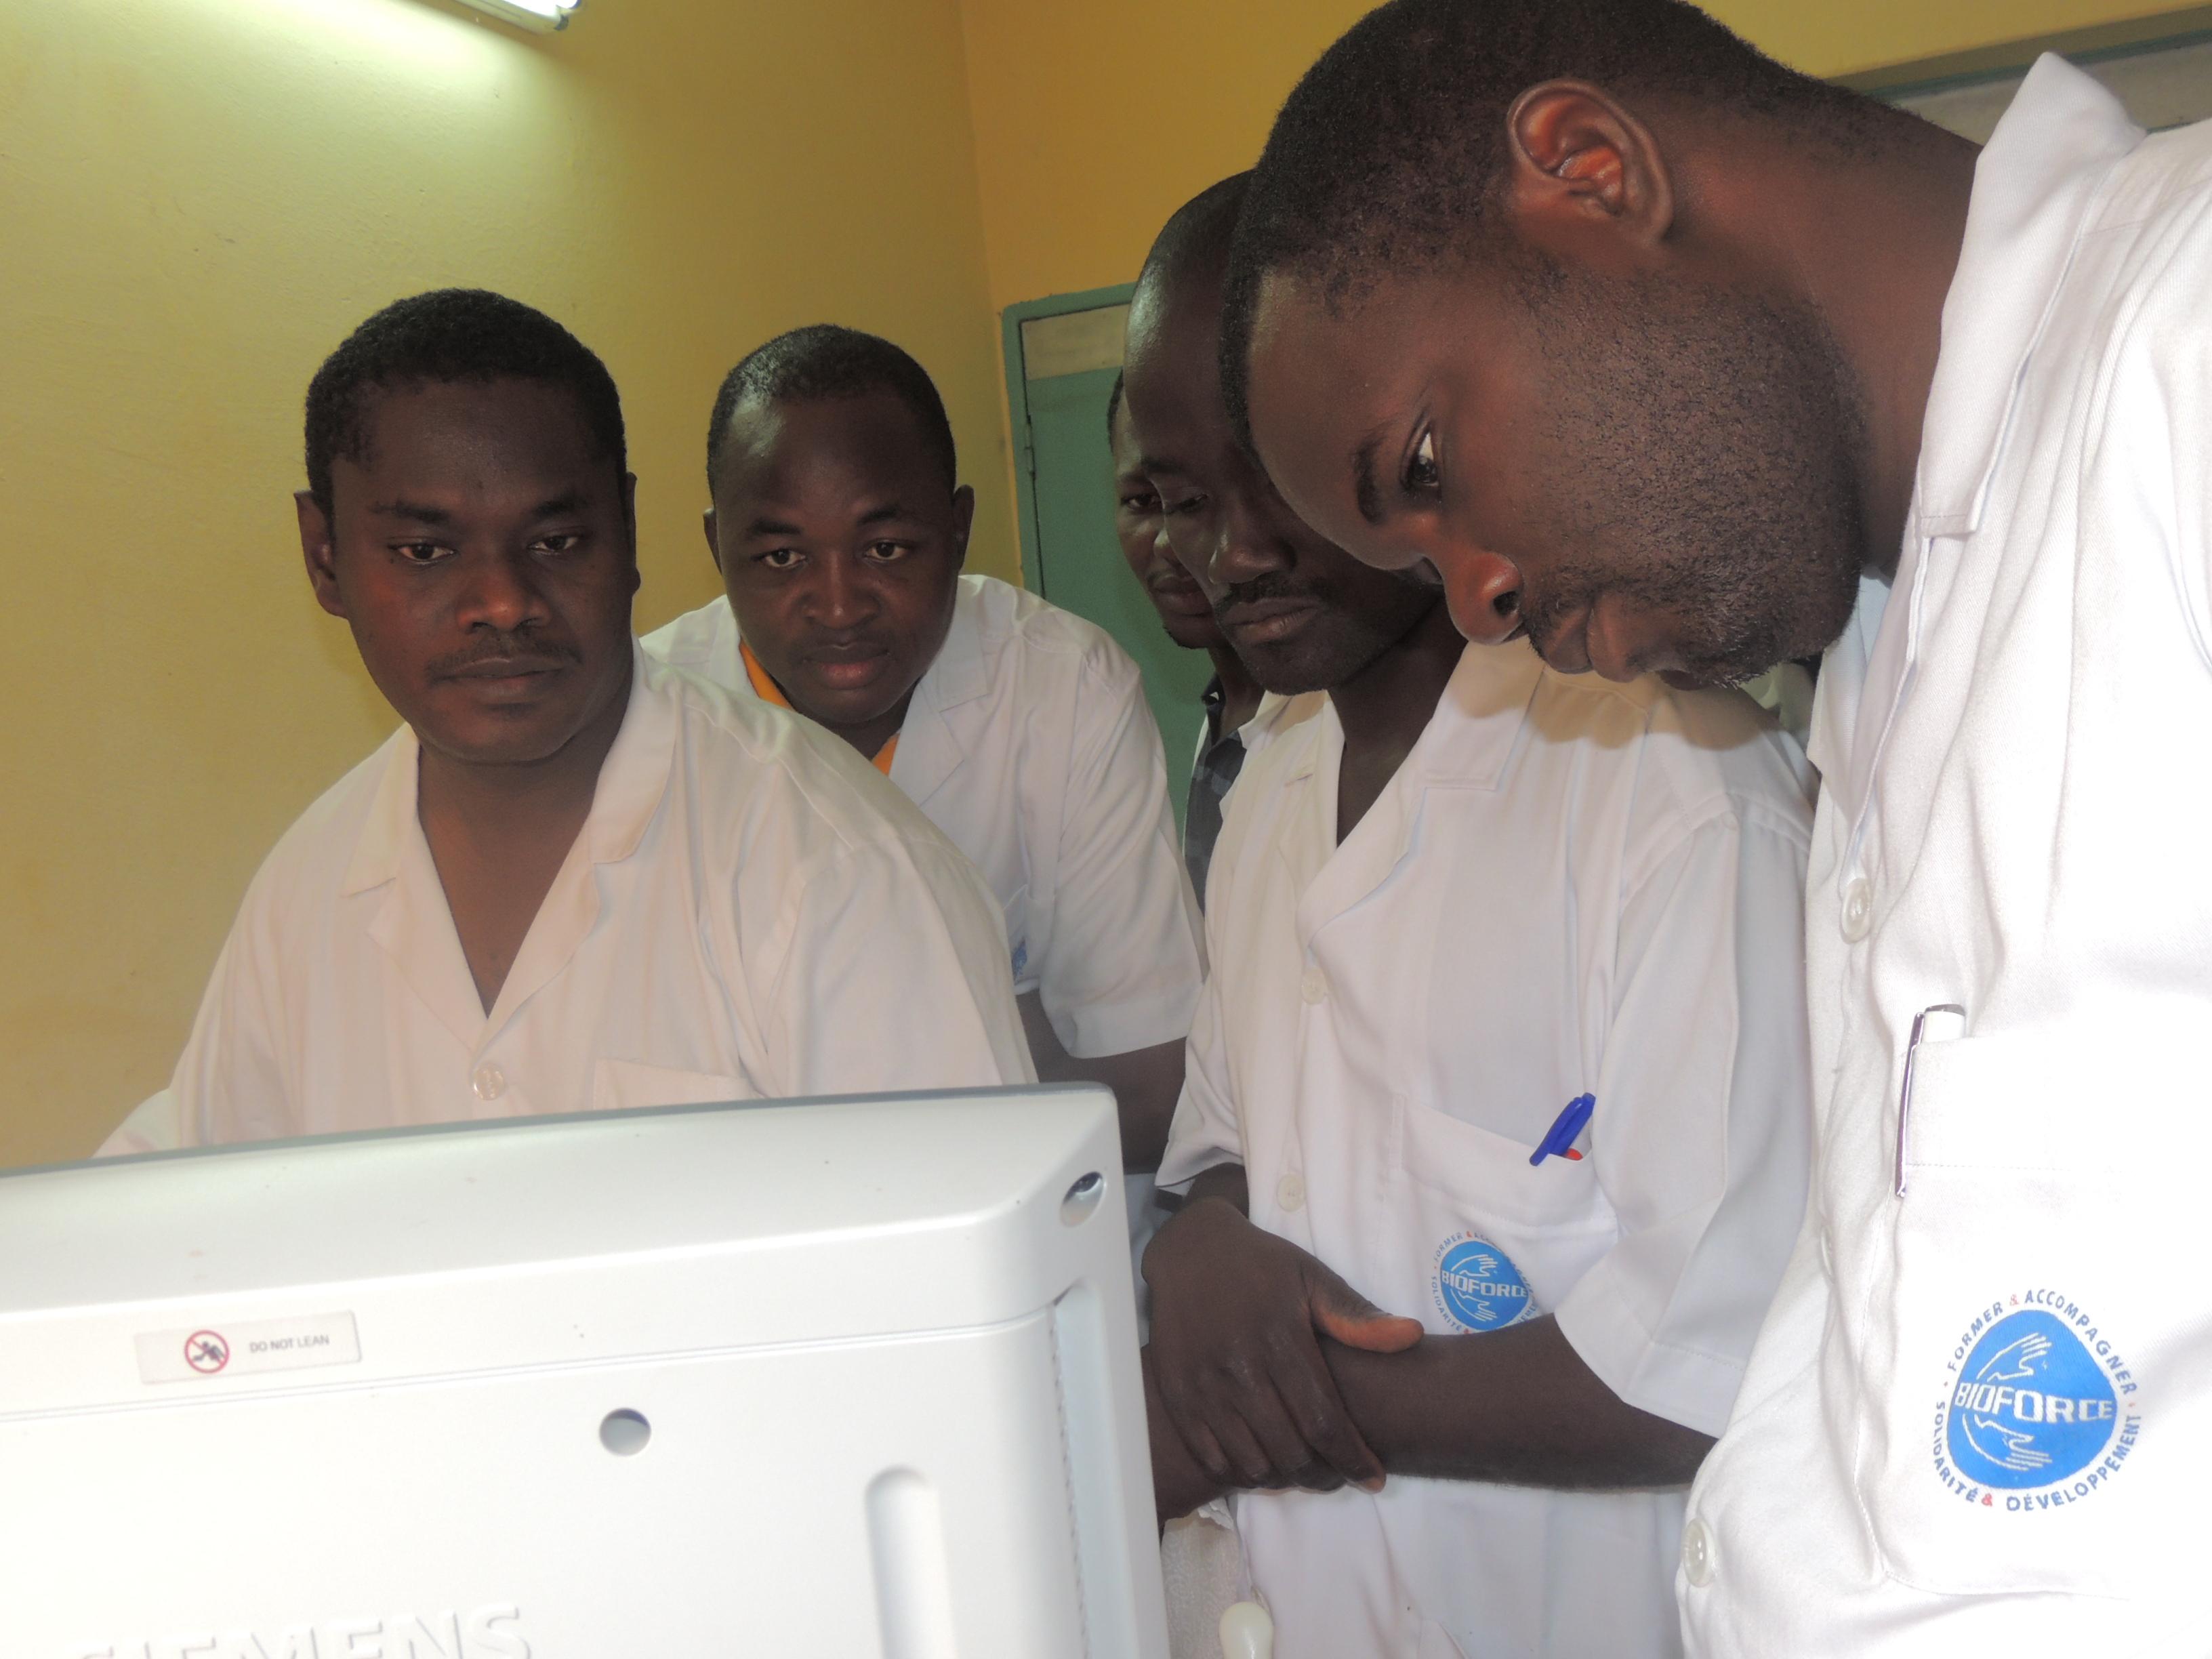 Developing staff skills in healthcare logistics